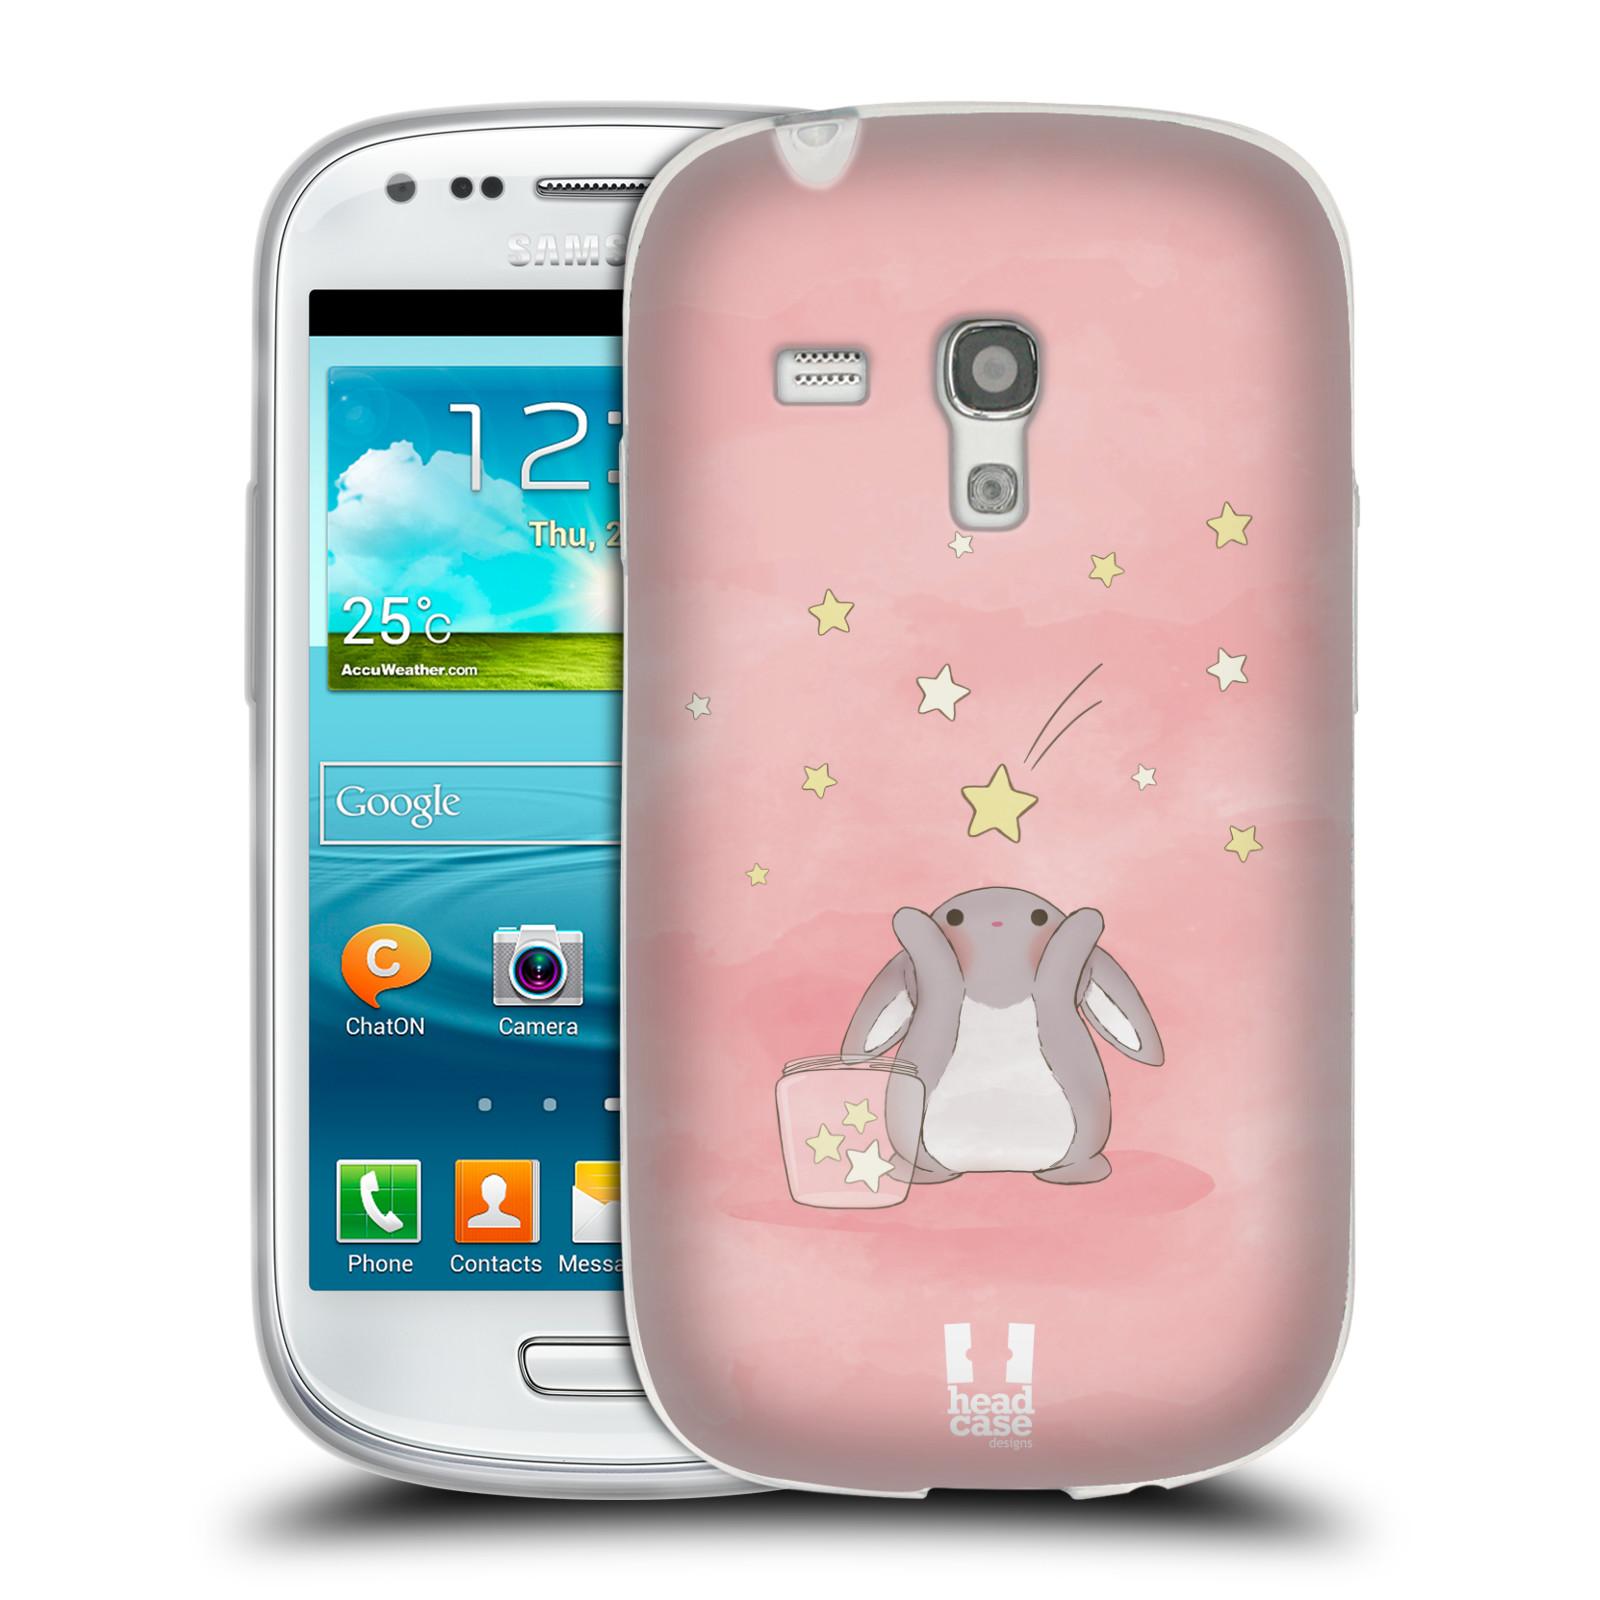 HEAD CASE silikonový obal na mobil Samsung Galaxy S3 MINI i8190 vzor králíček a hvězdy růžová